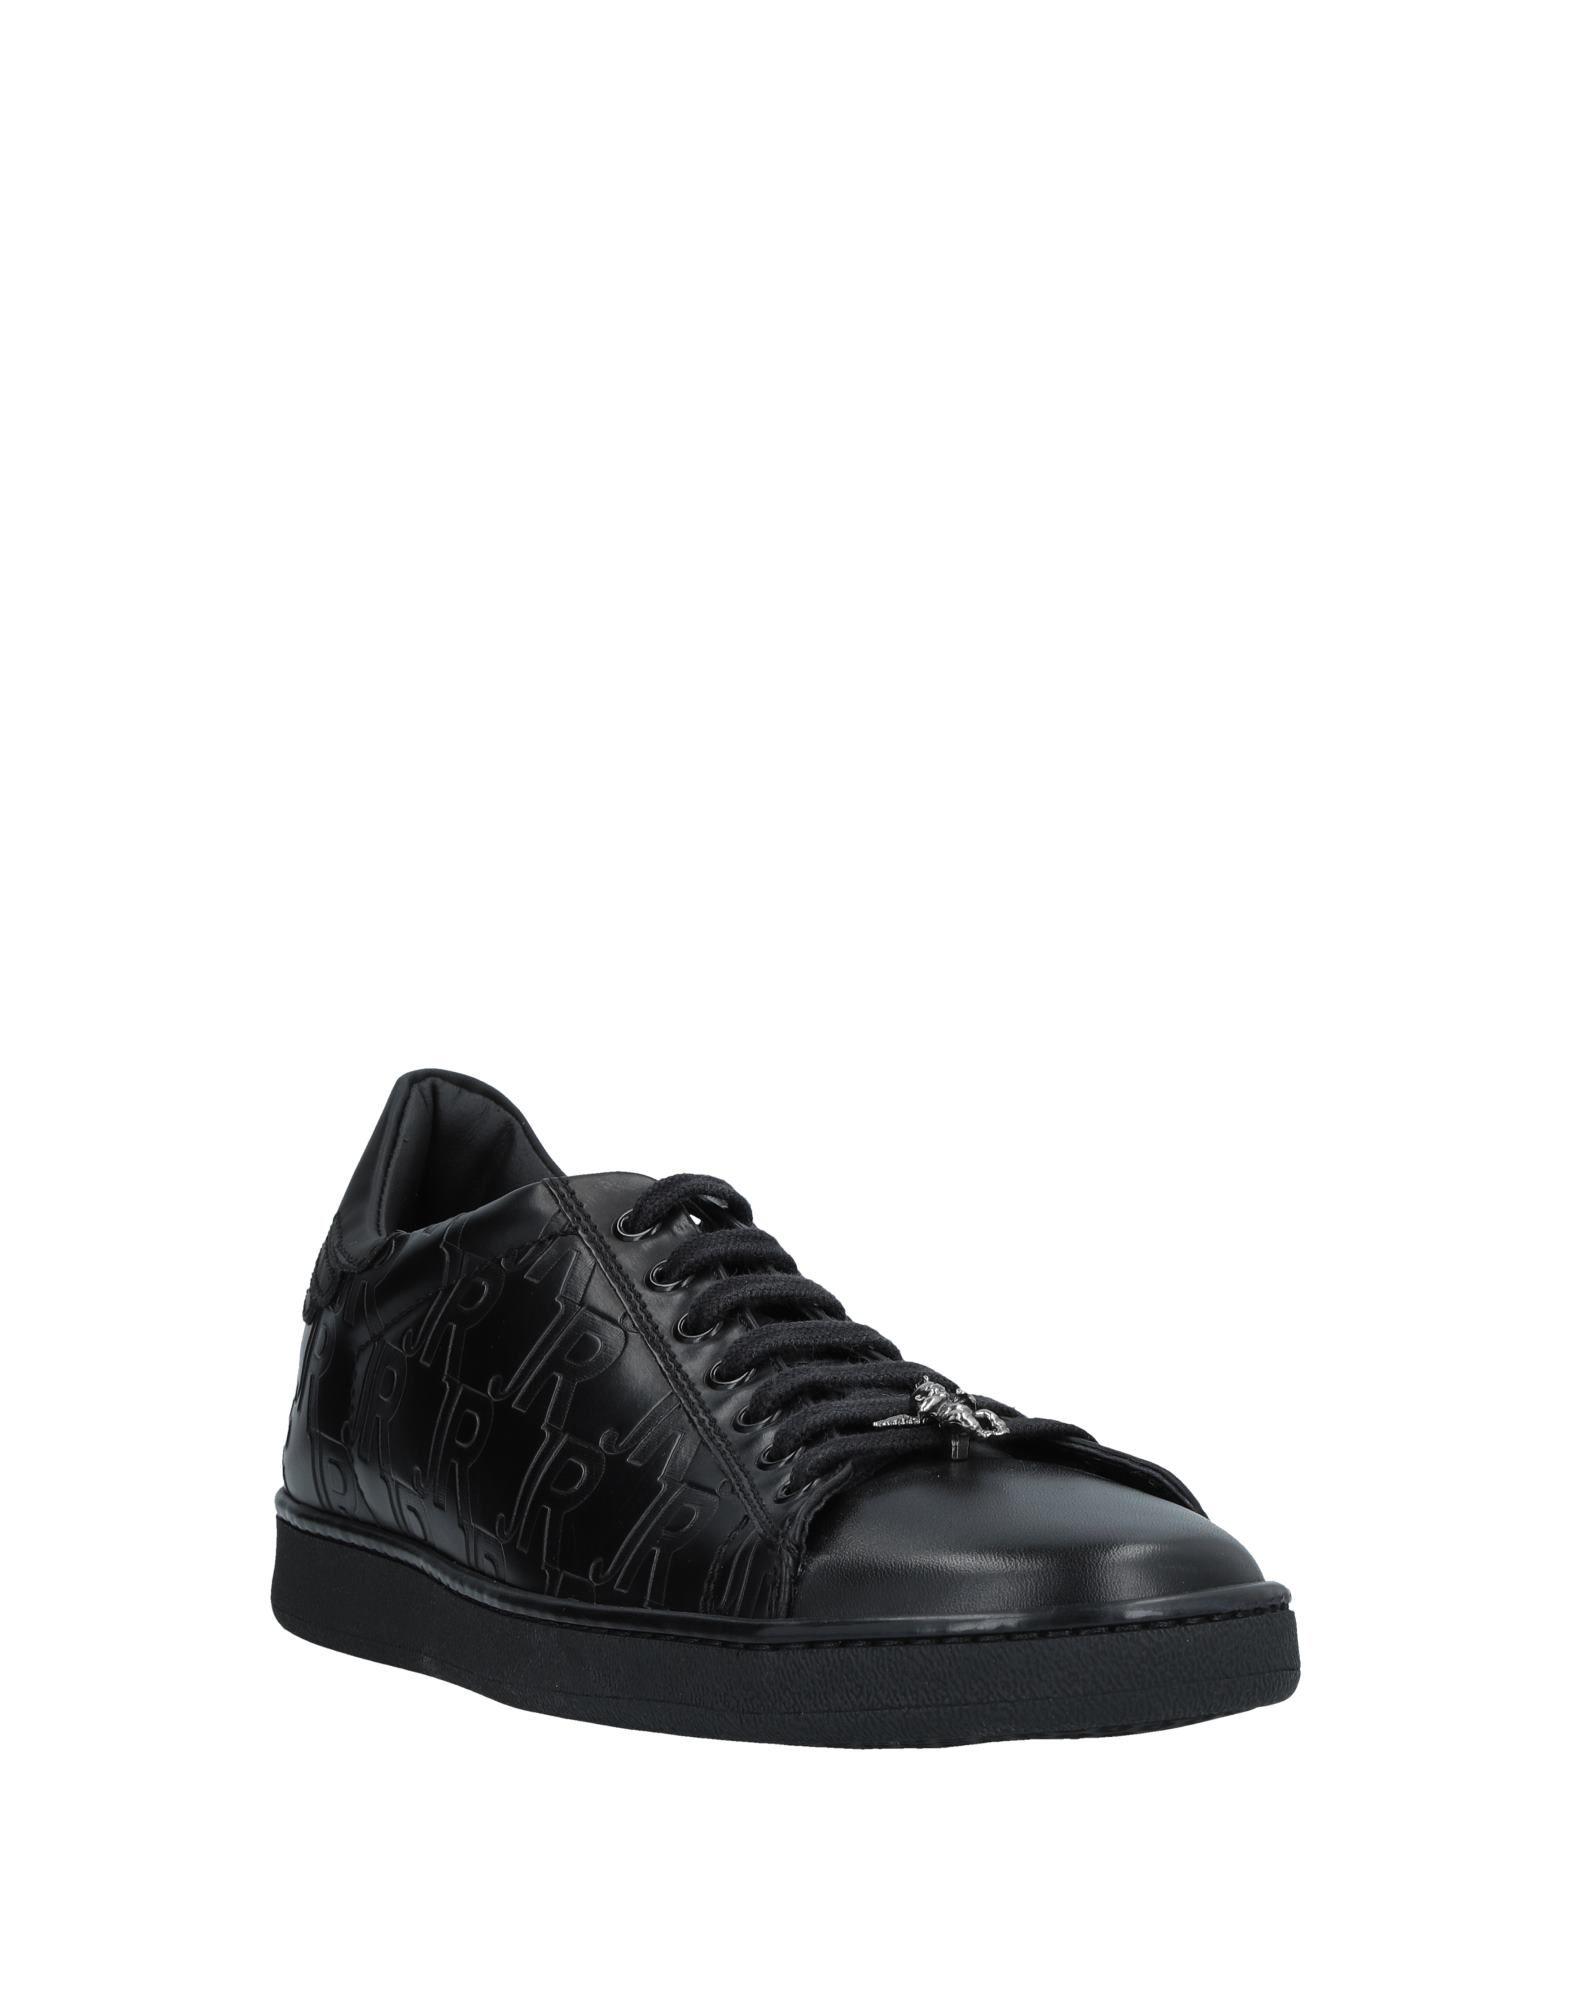 John Richmond Sneakers Herren beliebte  11538153TM Gute Qualität beliebte Herren Schuhe f94c32